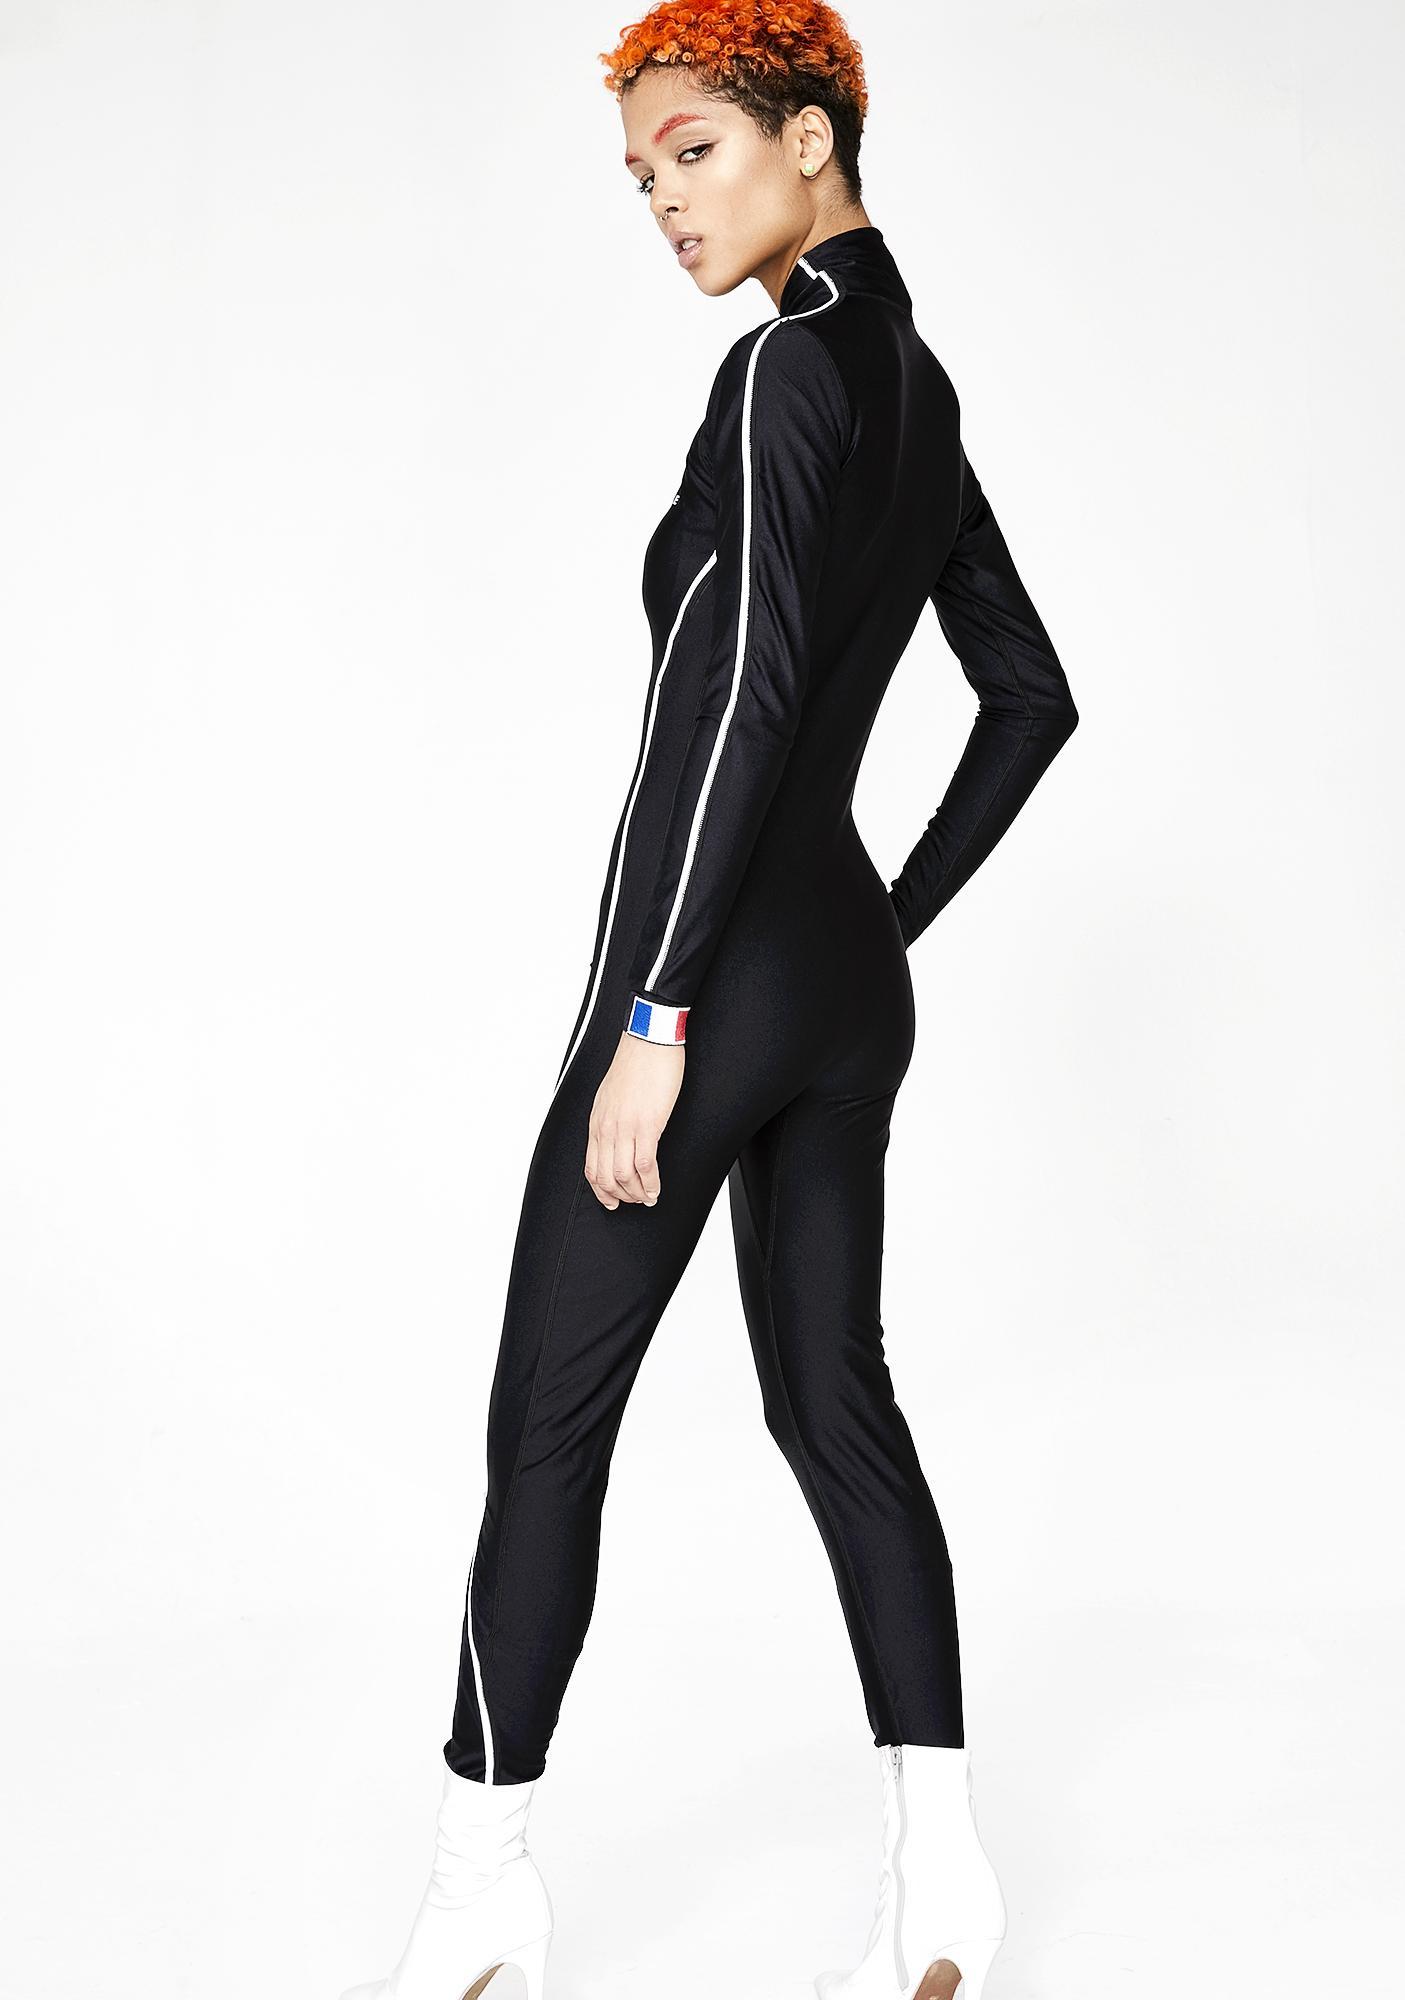 Varenne Sleek Zip Down Bodysuit